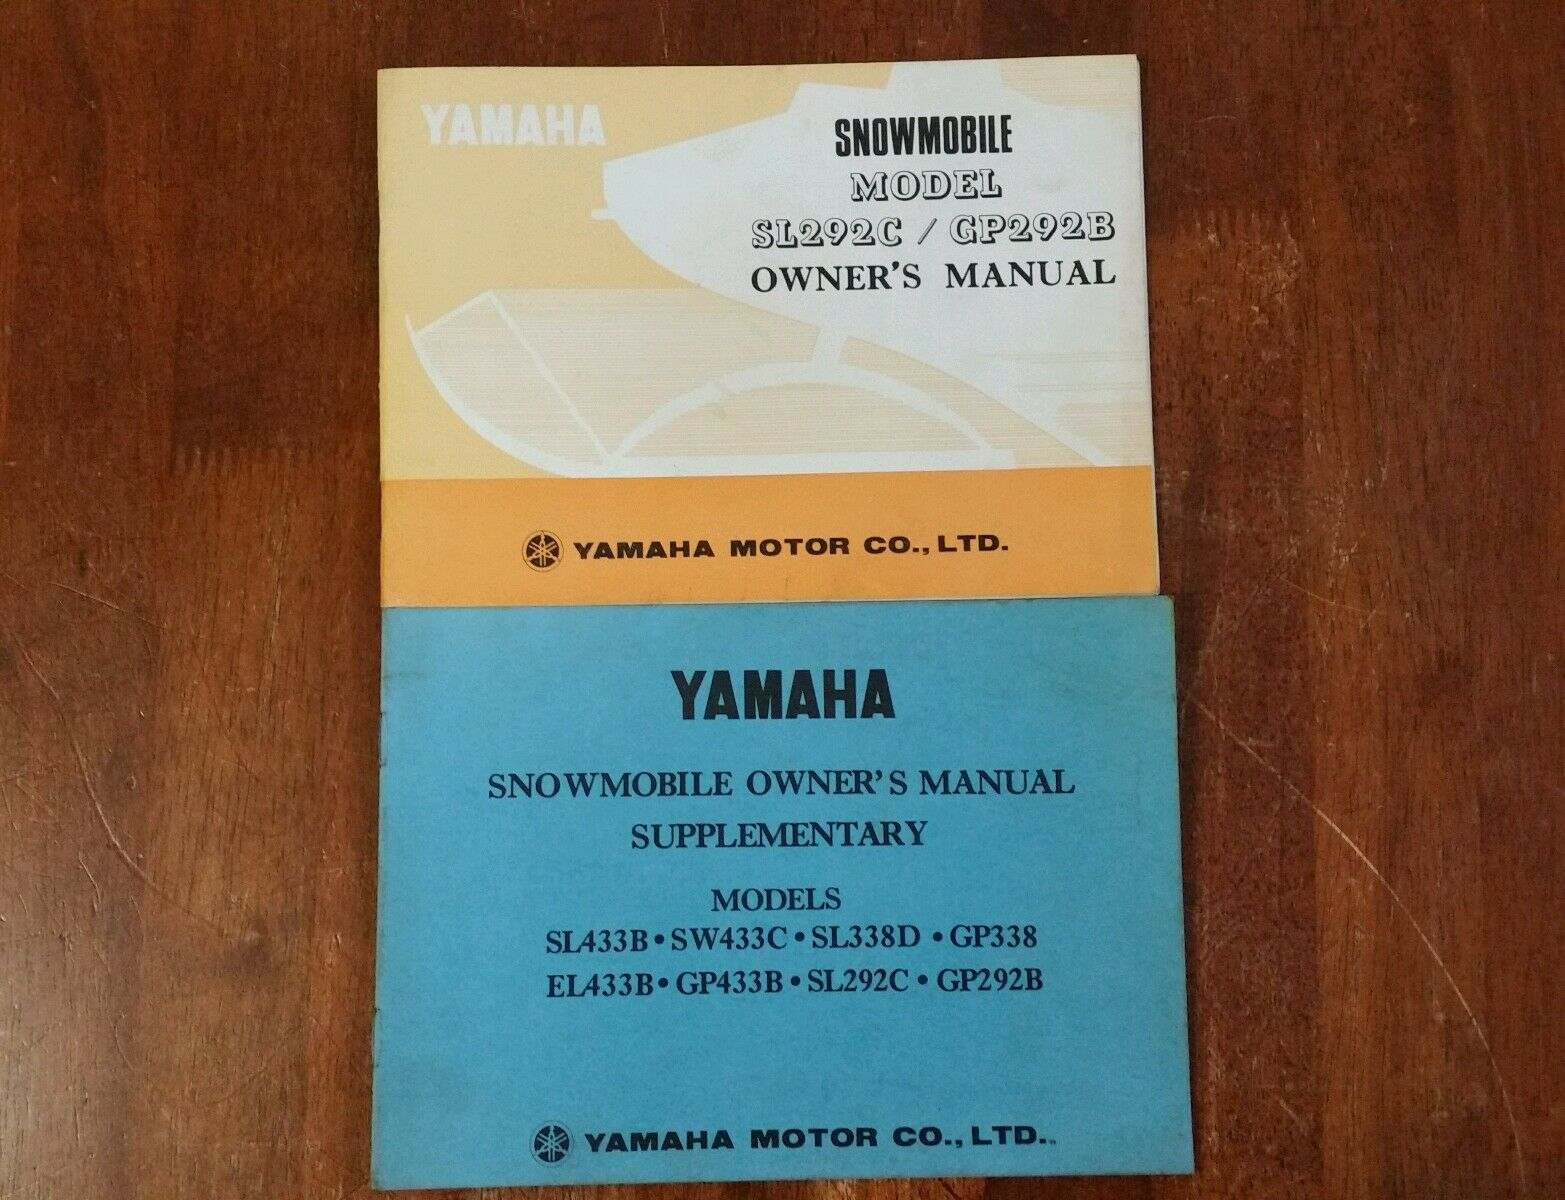 Vintage yamaha Snowmobile owner's manual  sl292c gp292b ski-doo moto ski mf  official quality